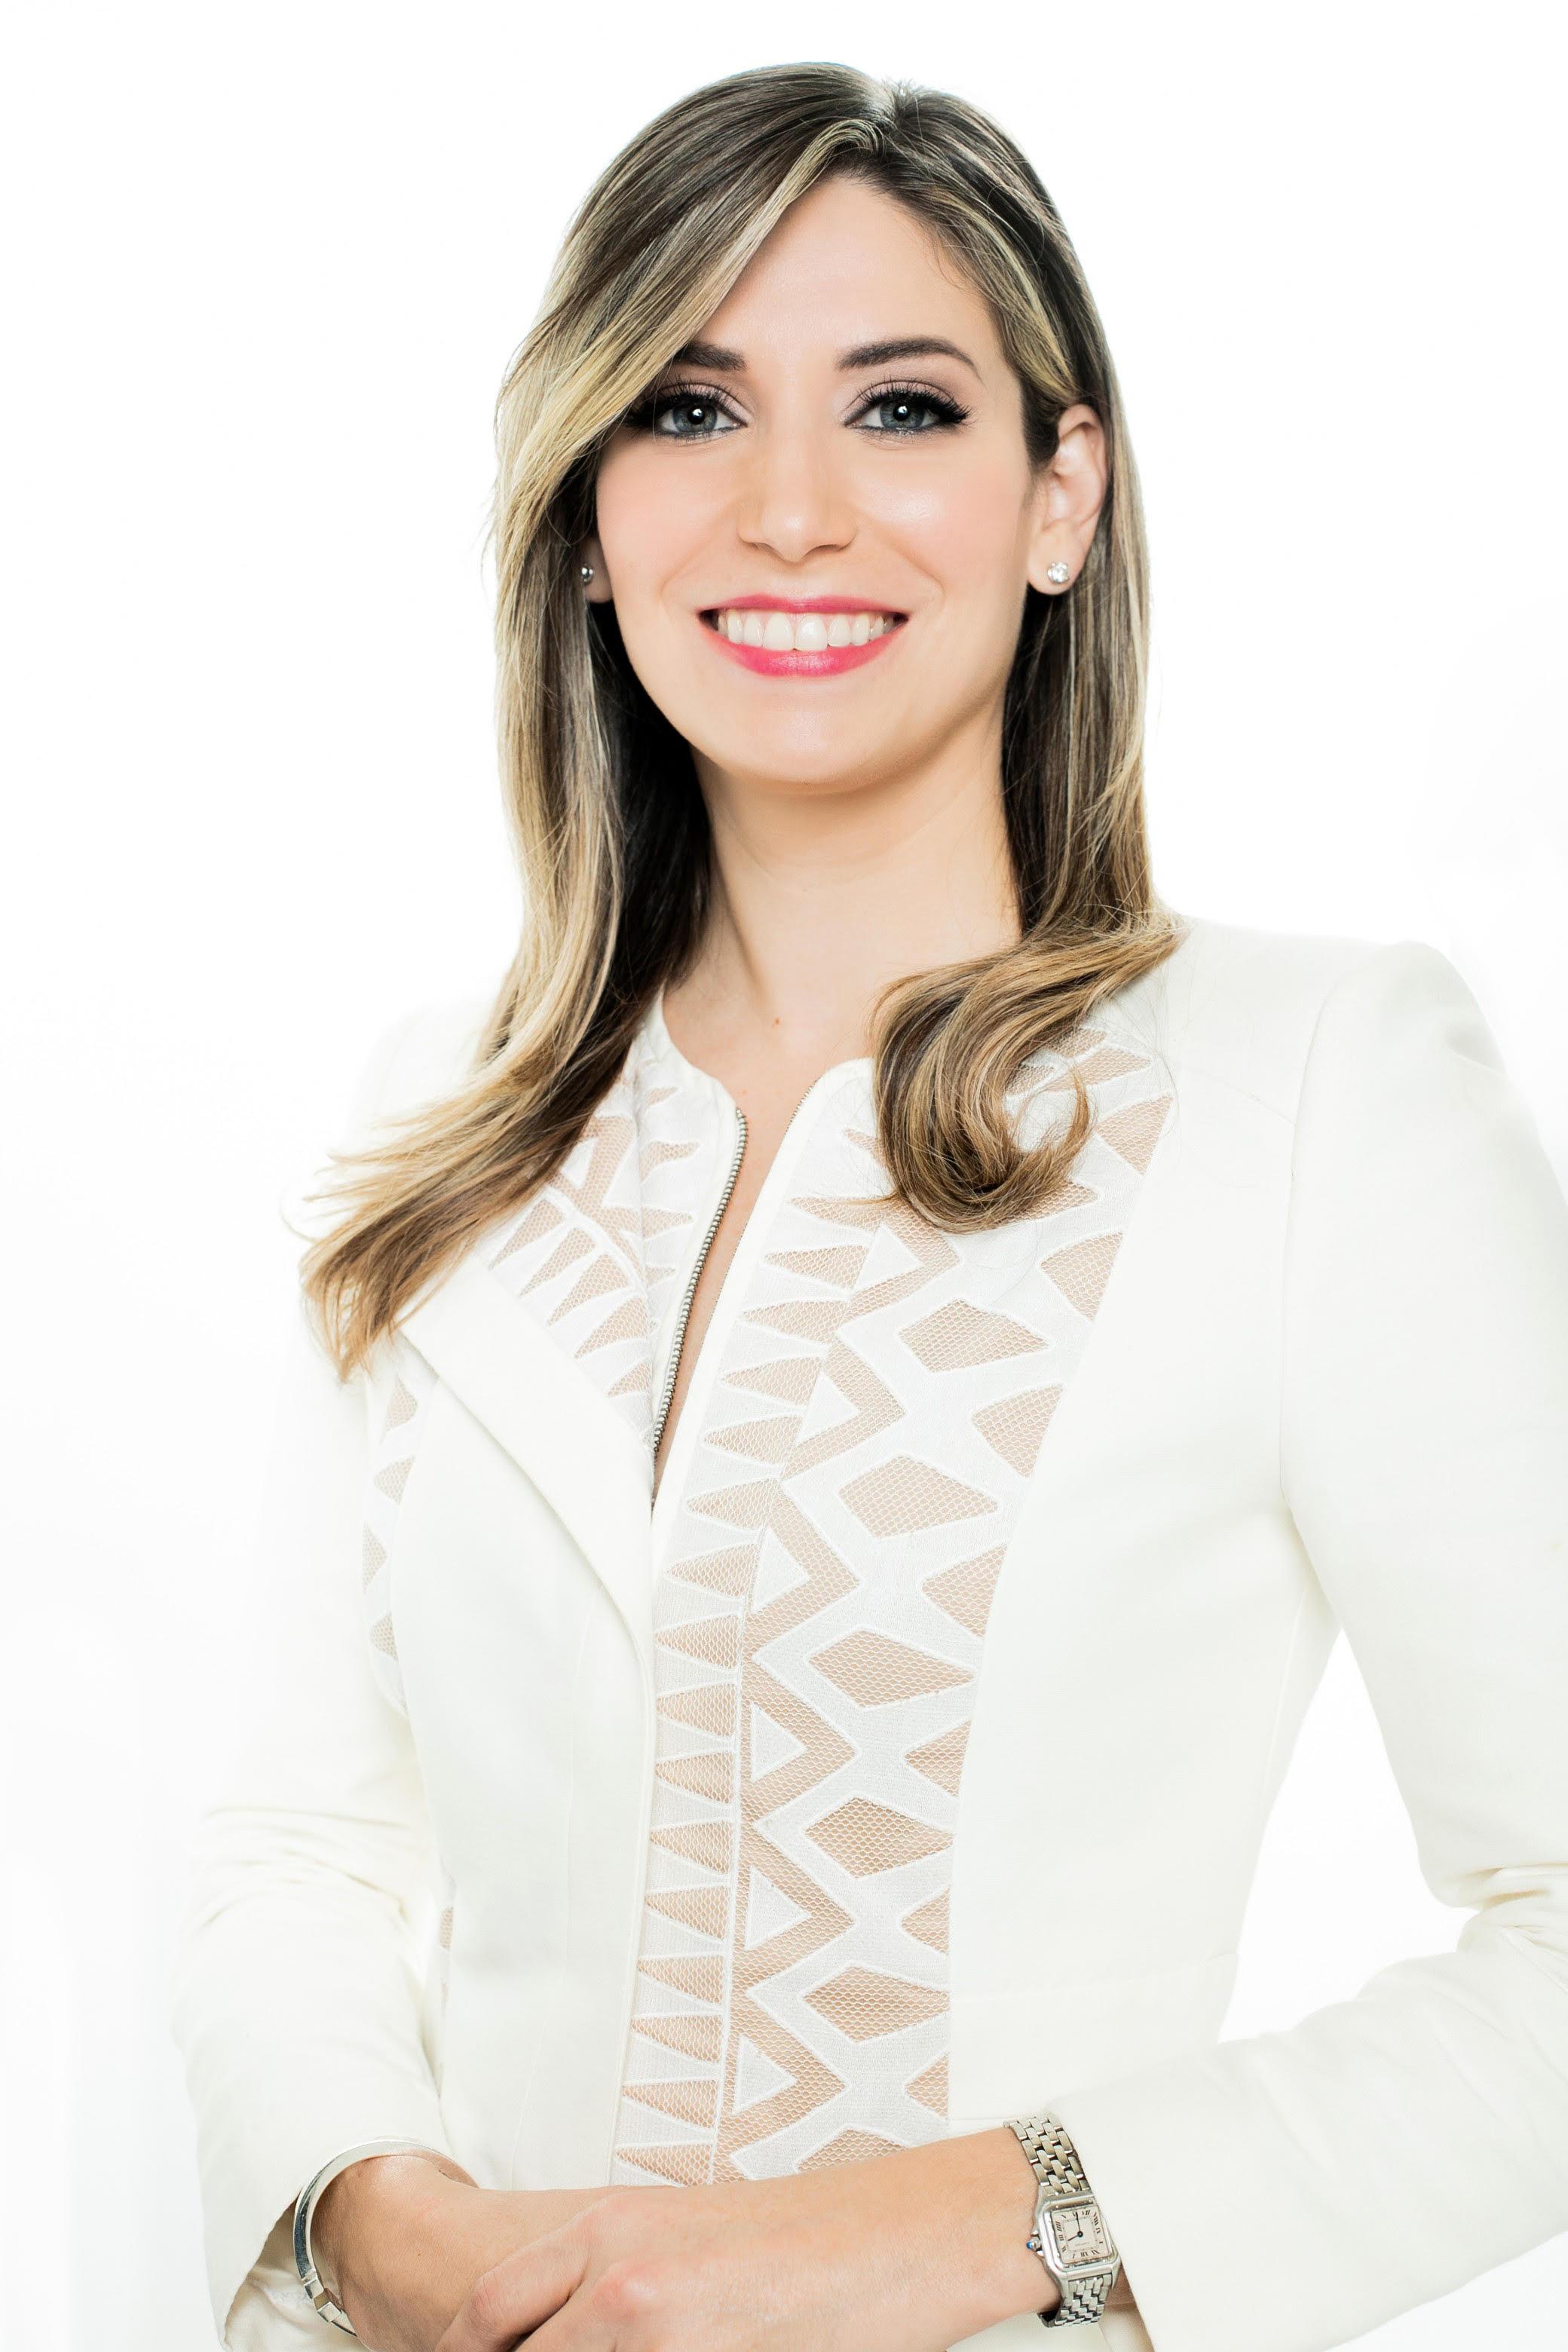 Monica Alvarez Sastre